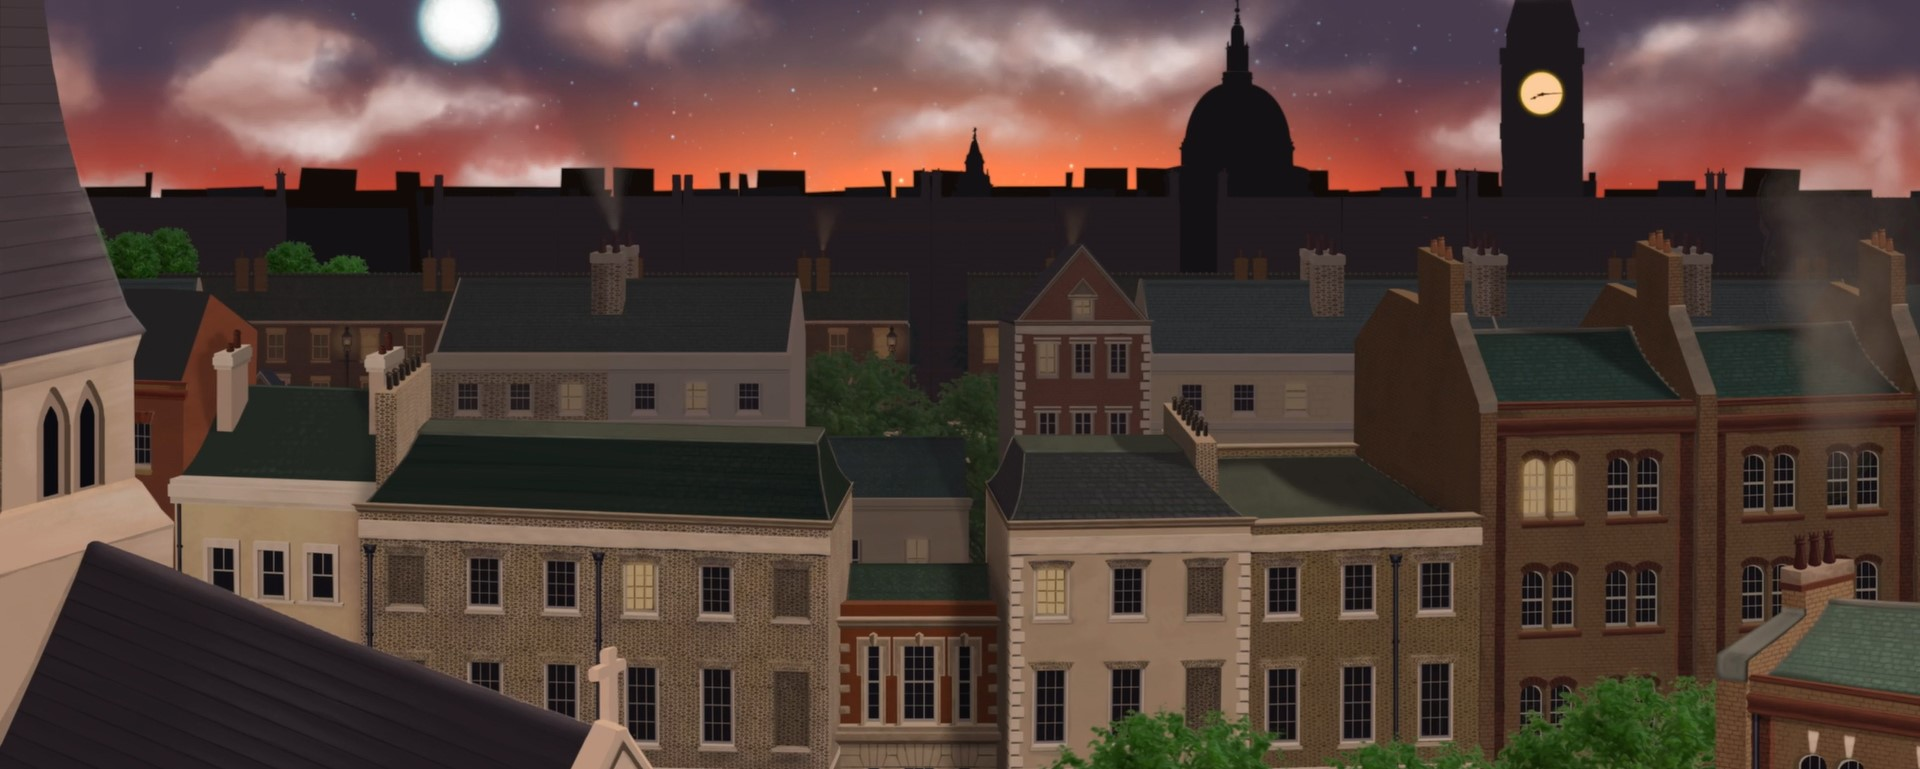 London (Peter Pan)